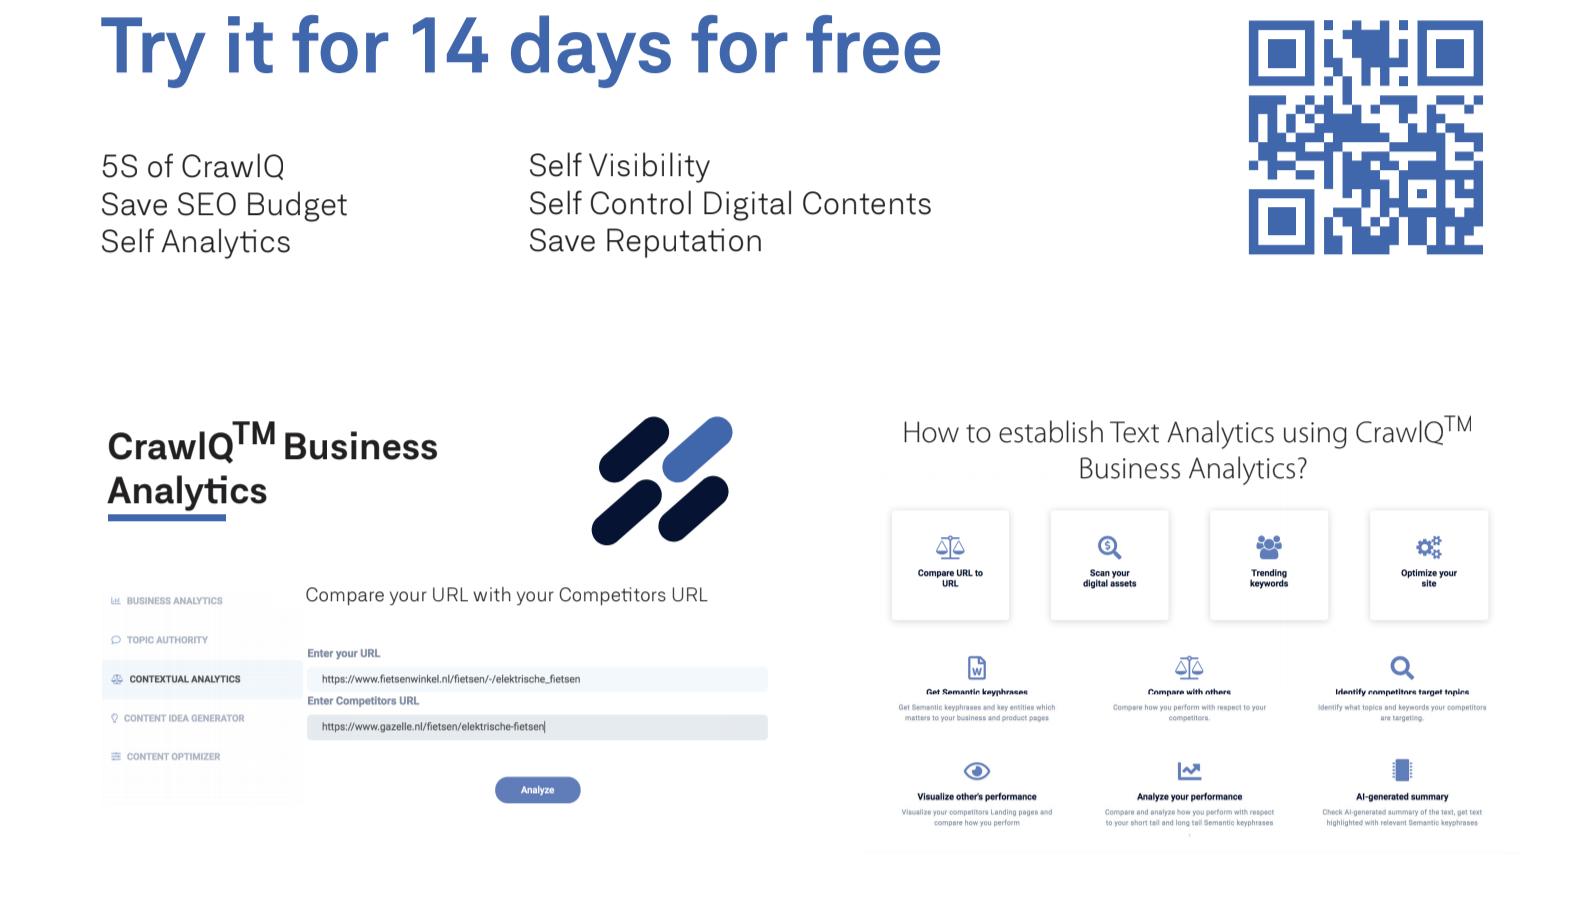 Topic Authority, Contextual Analytics, Content Optimisation and Content Idea Generator using AI in SEO Tool CrawlQ